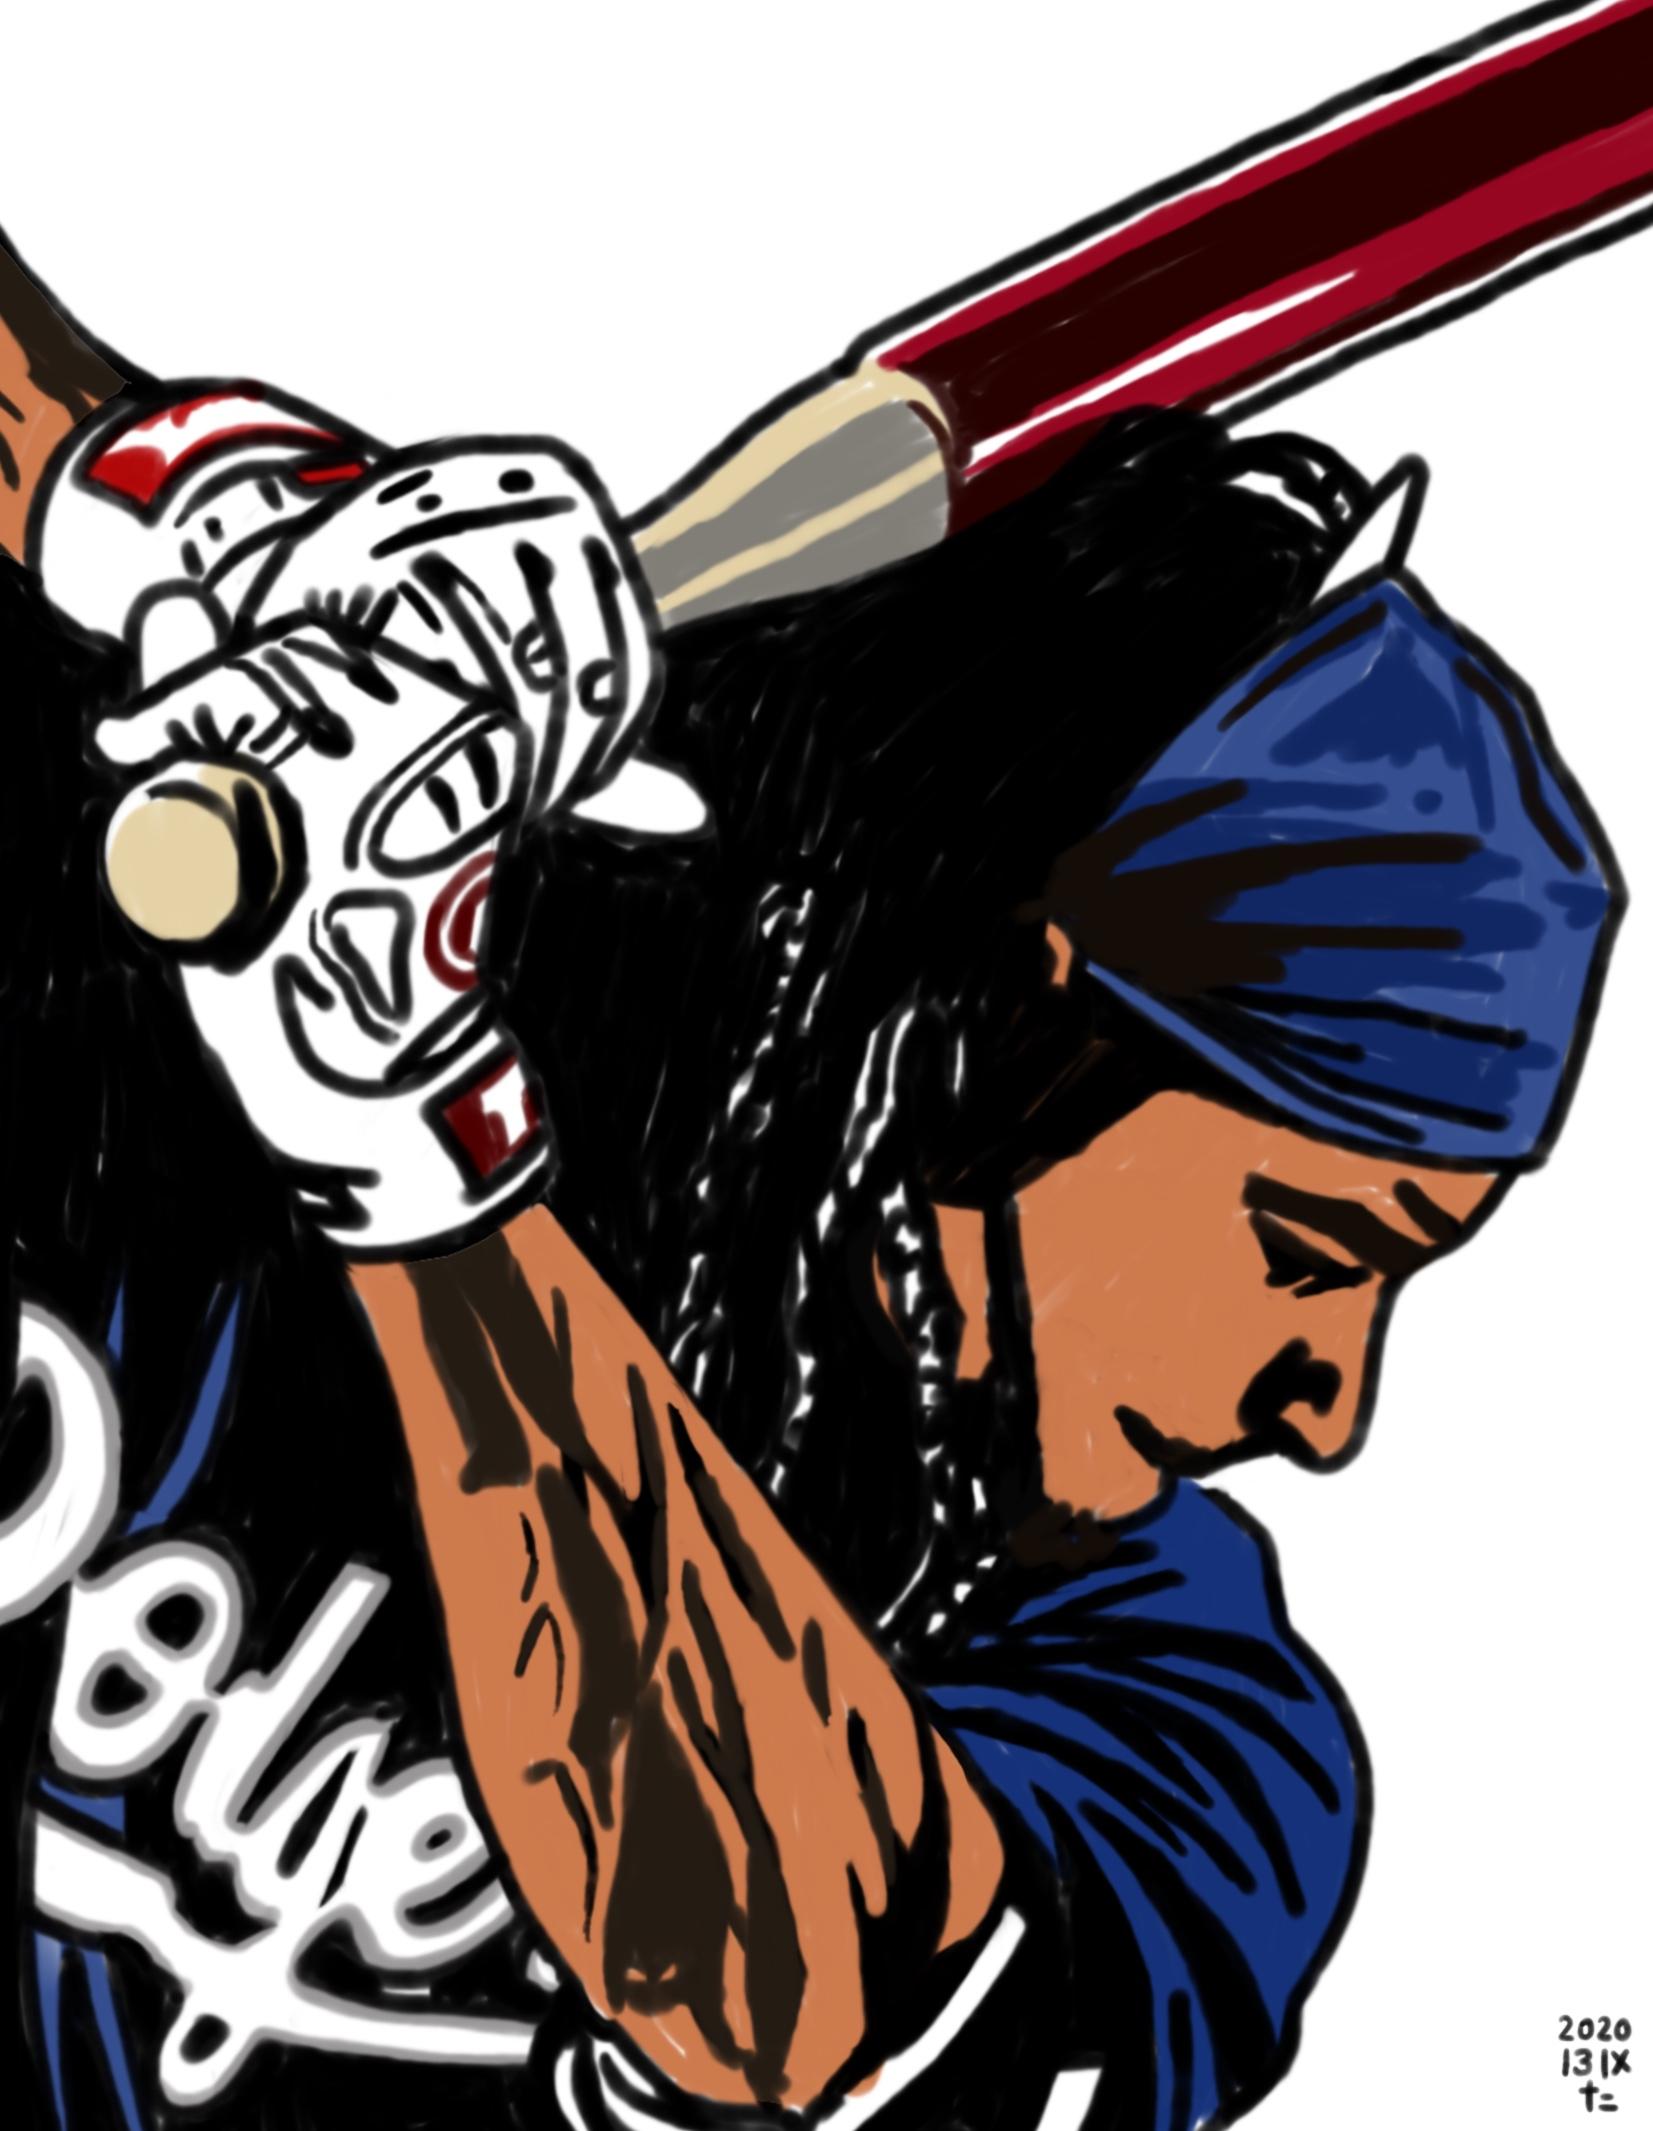 illustration of Los Angeles Dodgers Manny Ramirez's swing